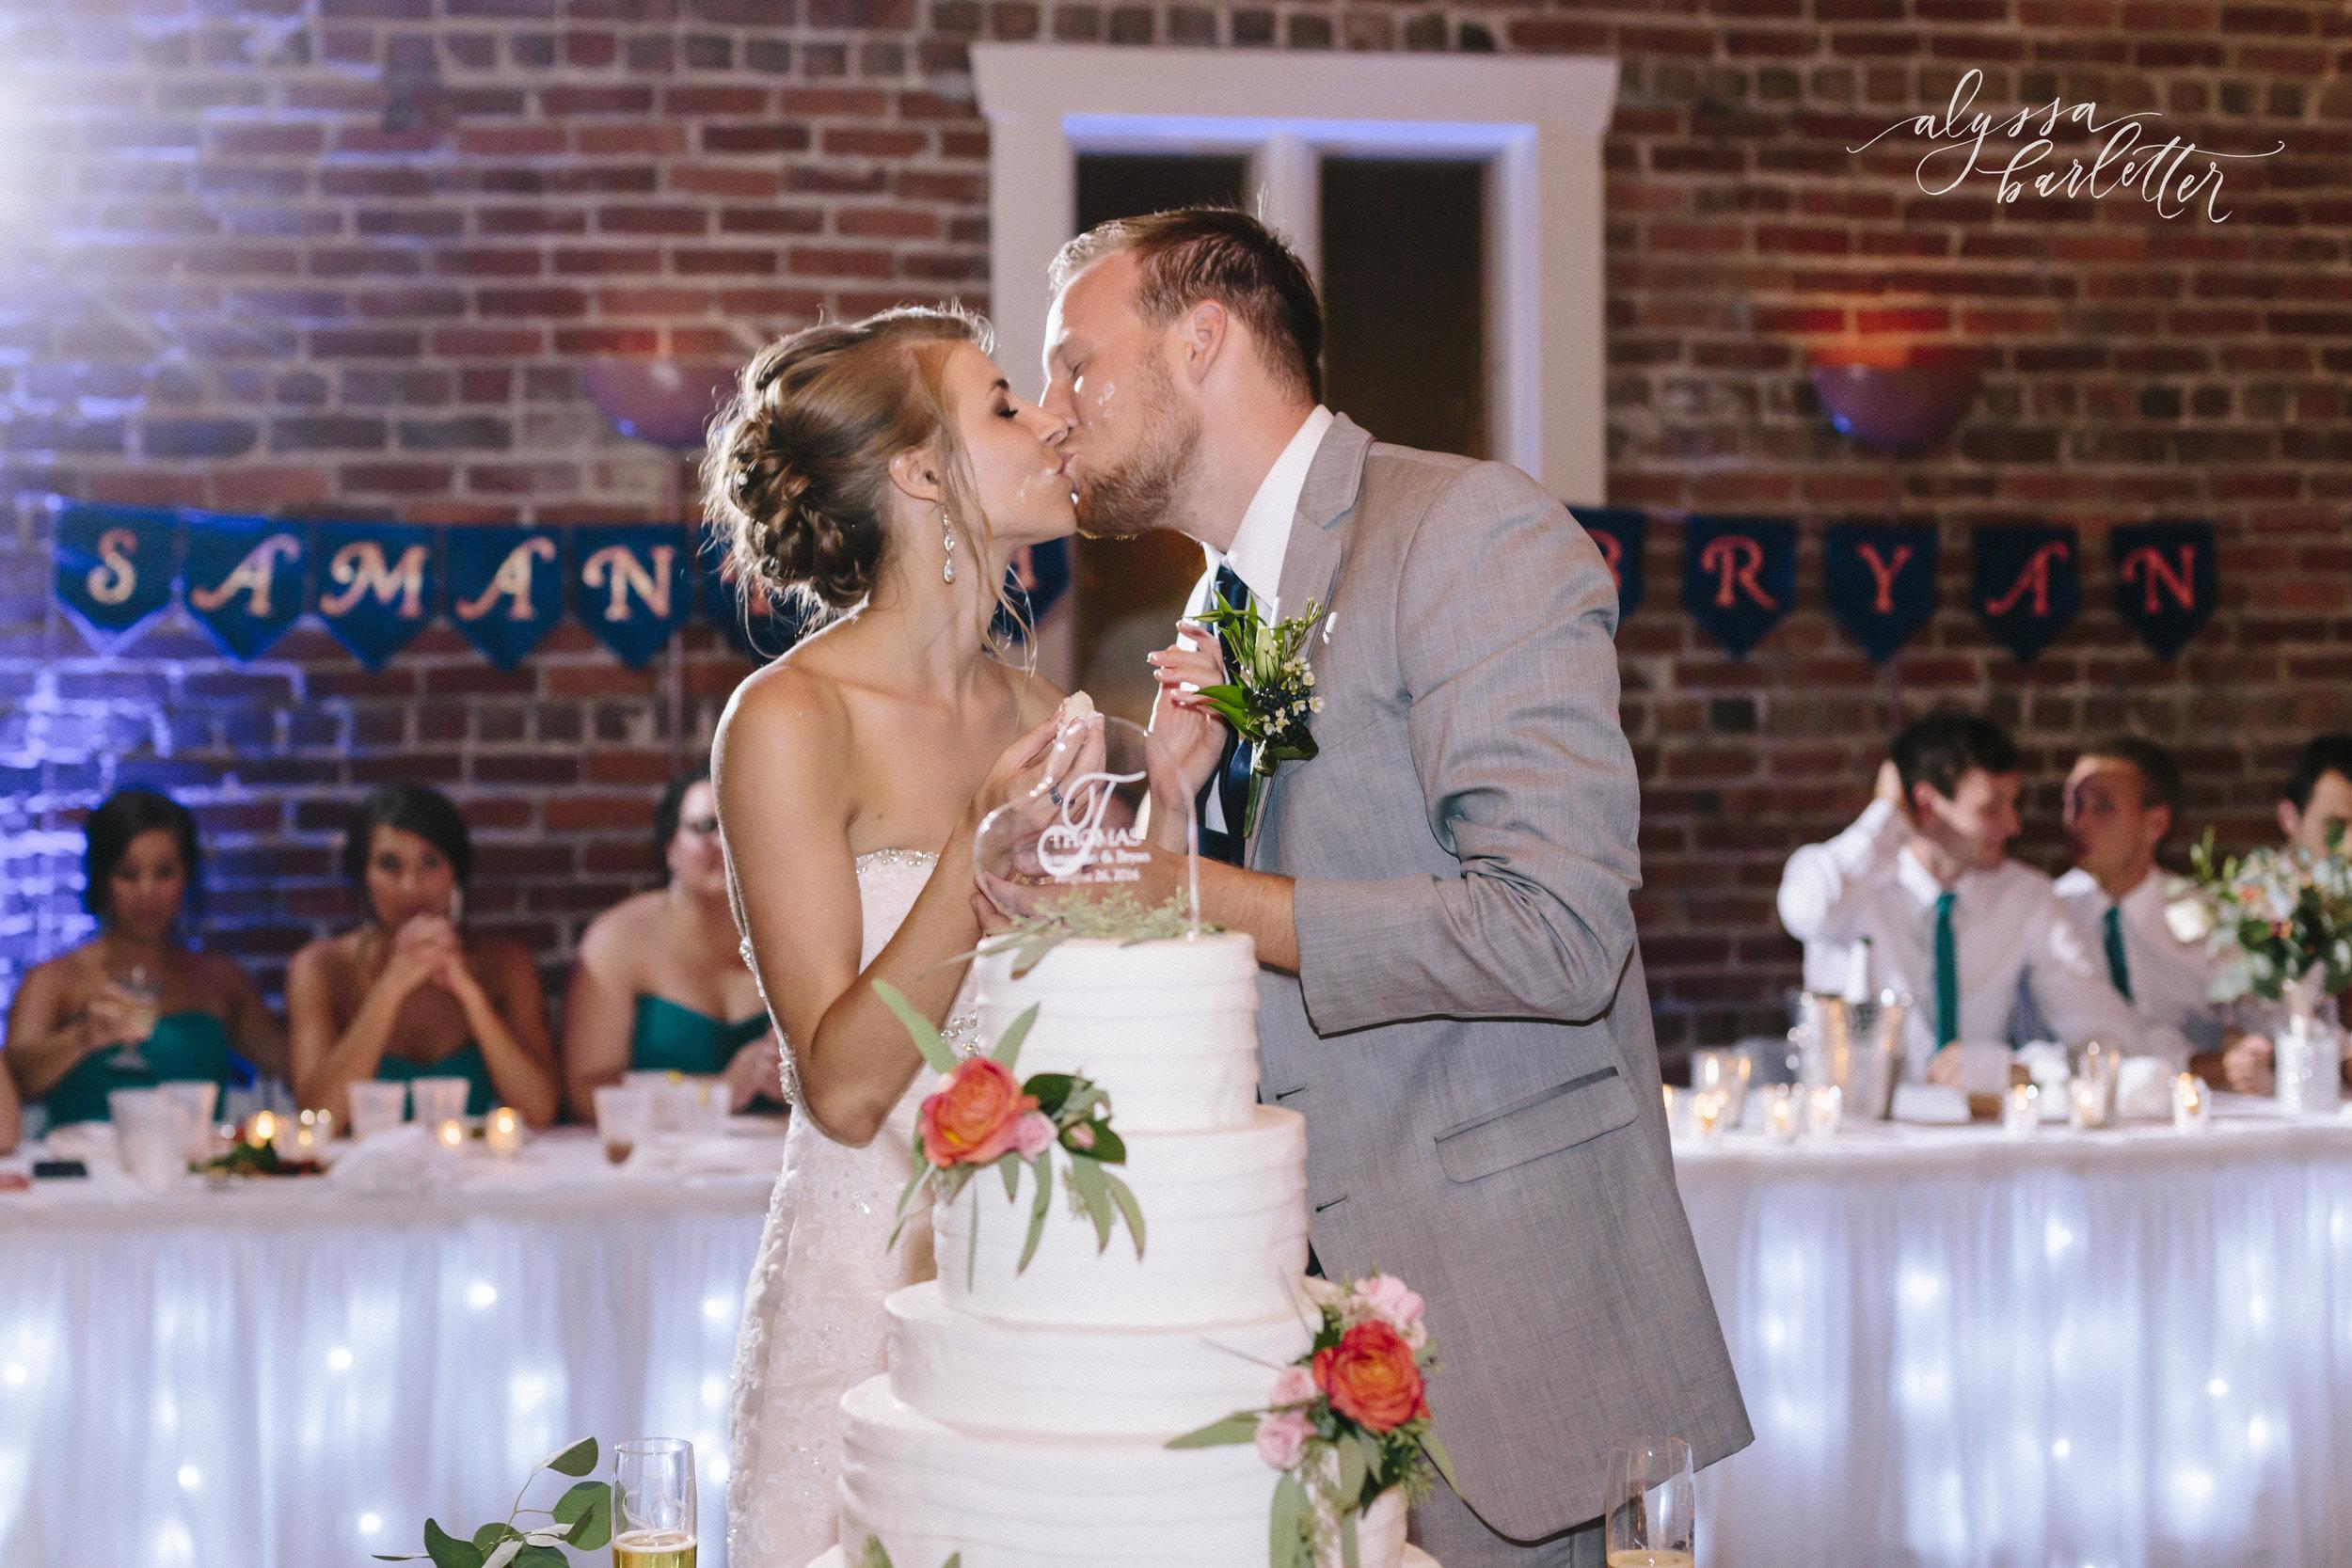 kansas city wedding photographer westport californos reception bride groom cake kiss